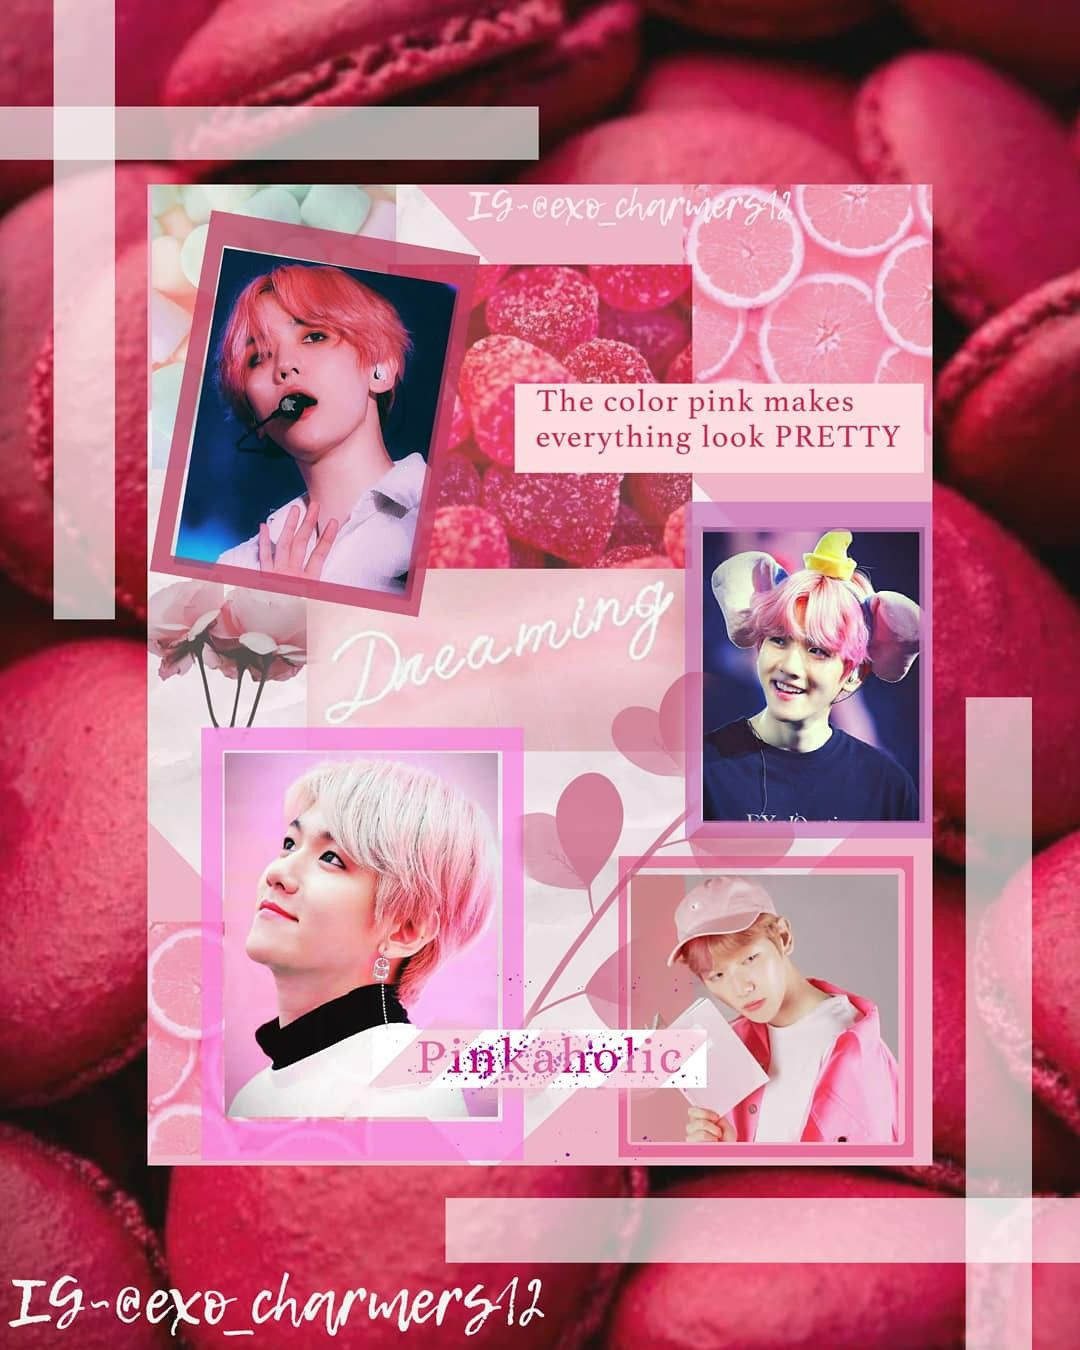 Exo Baekhyun Edit How To Look Pretty Pink Pretty